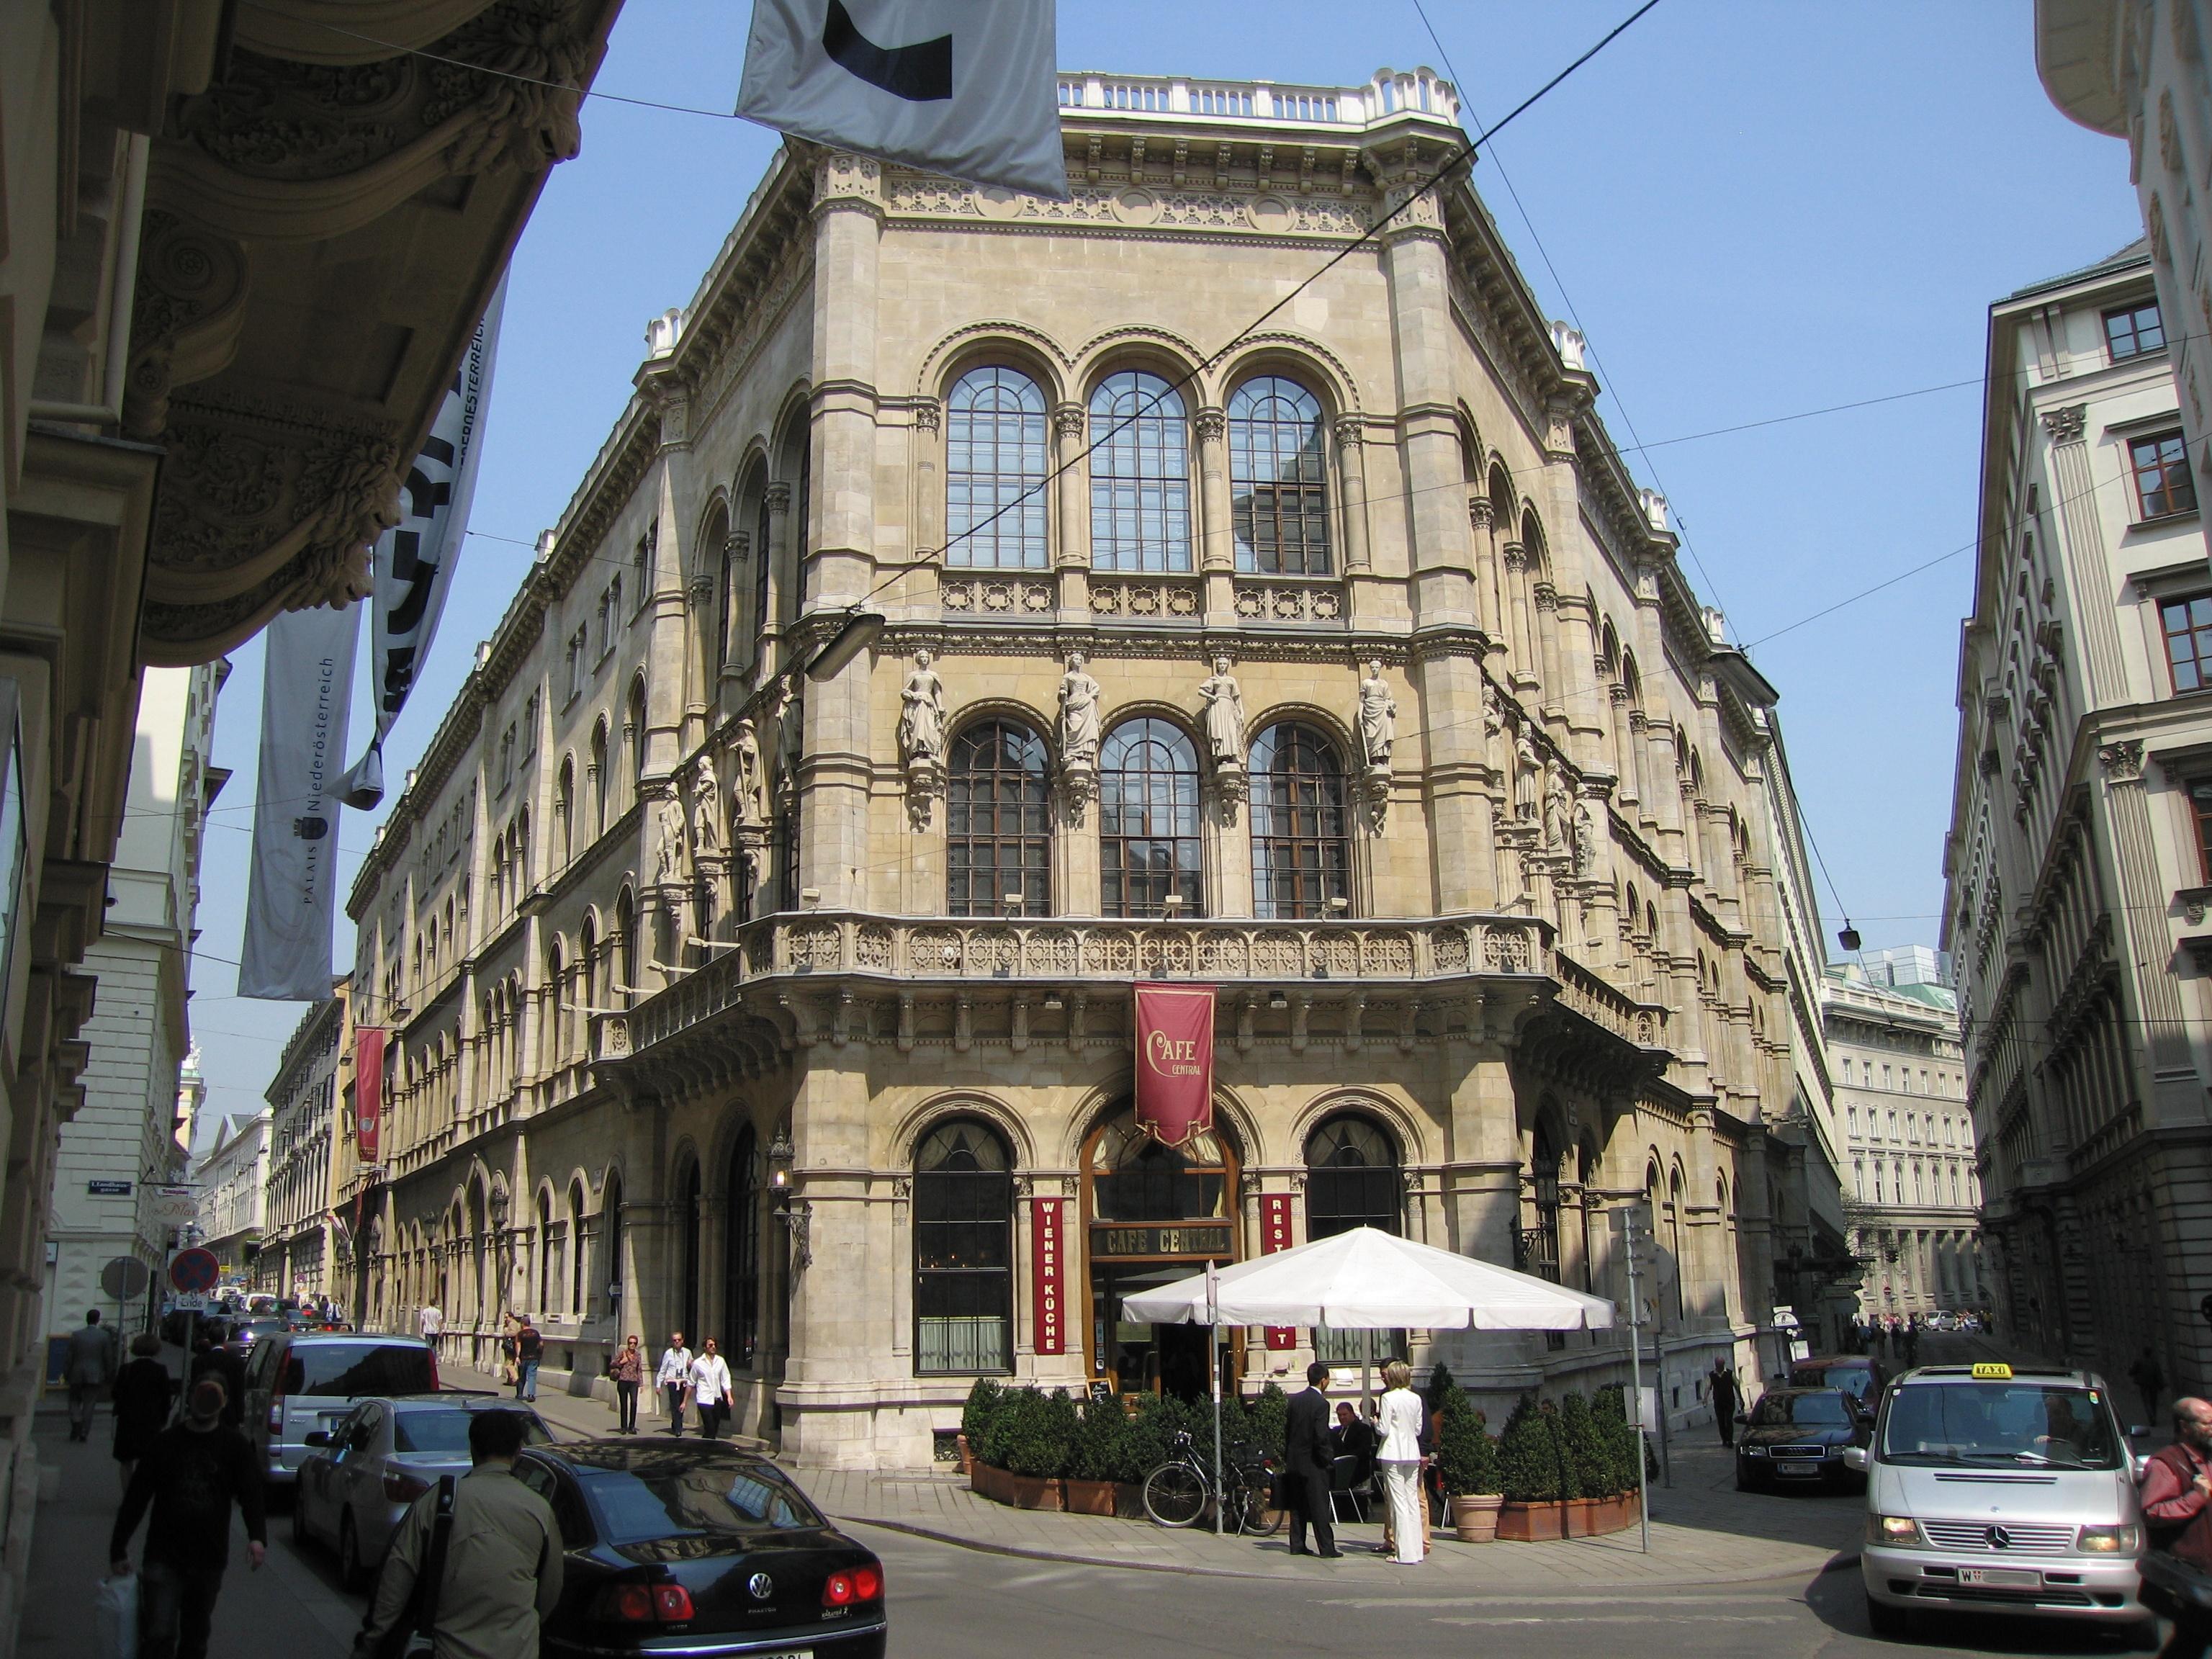 Cafe Central Speisekarte Jestetten